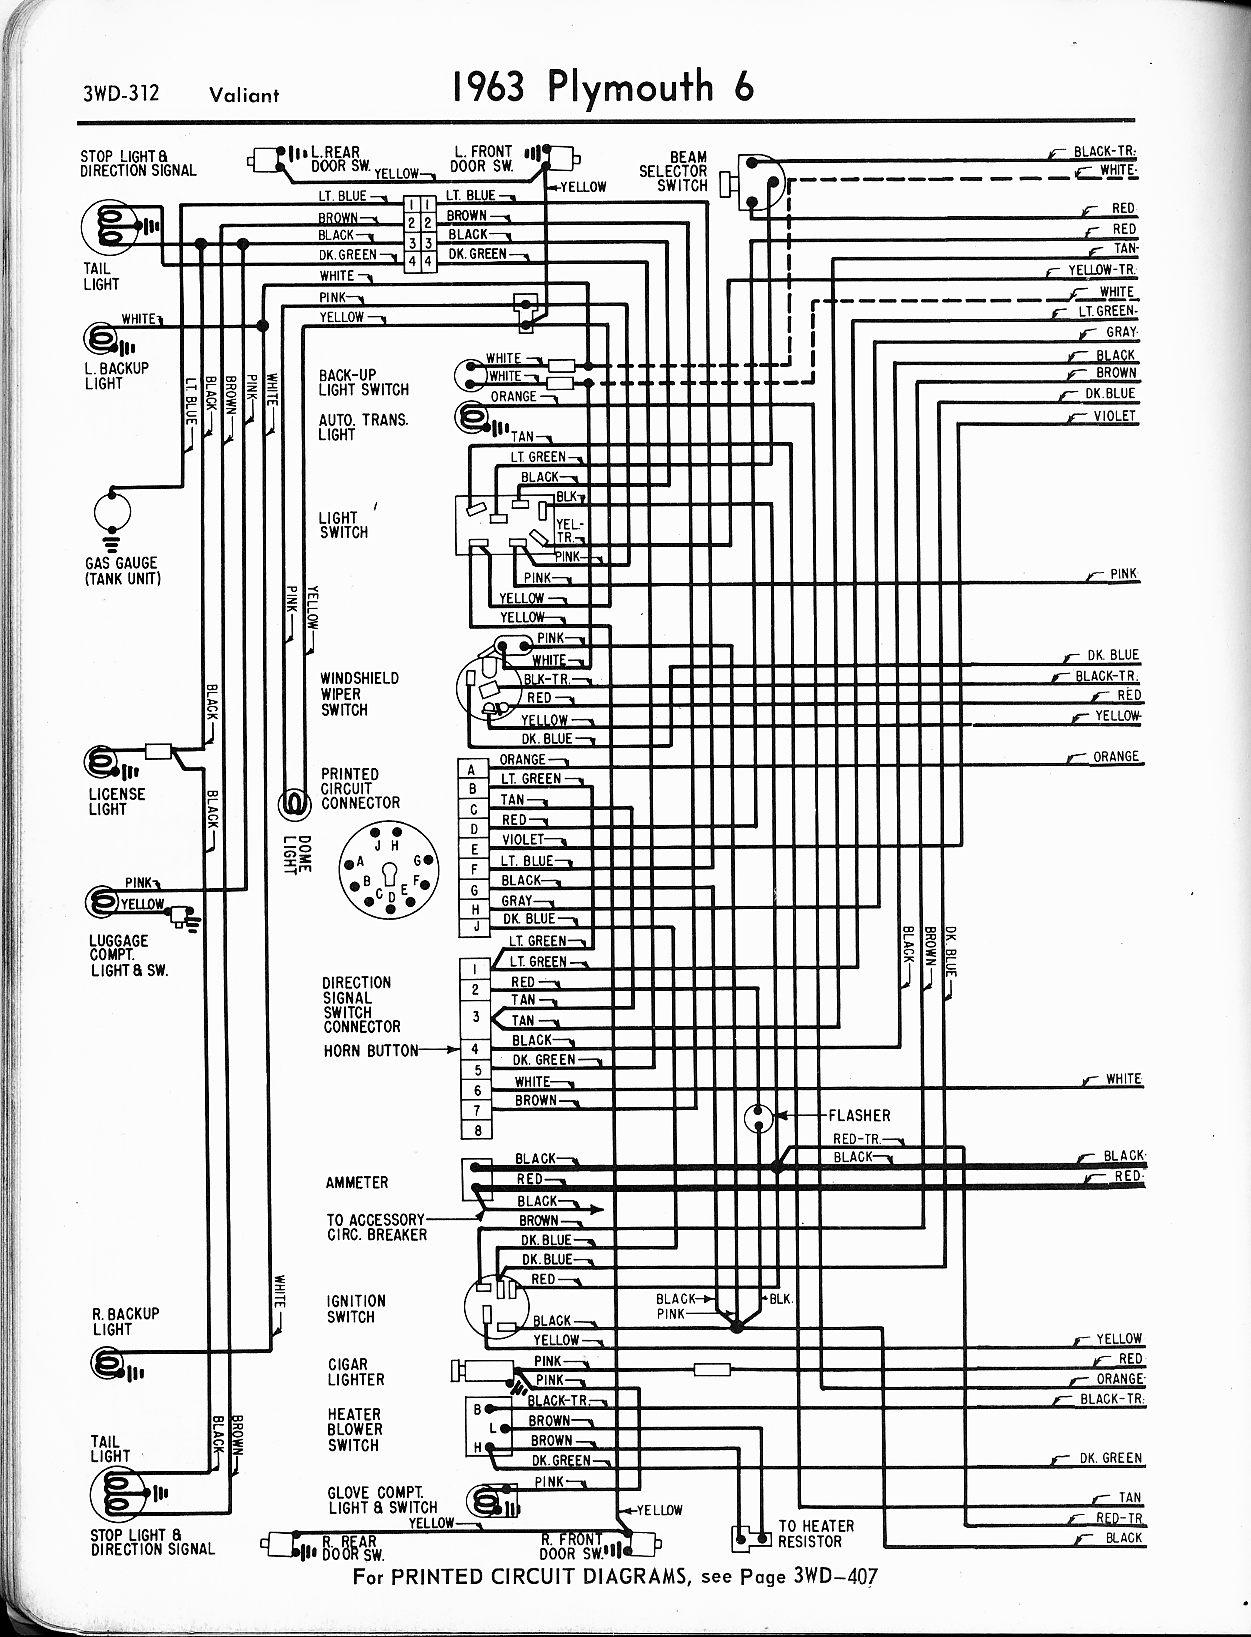 2 way intermediate wiring diagram furnace wire 67 plymouth barracuda library 1966 valiant schematics diagrams u2022 rh parntesis co 1967 1965